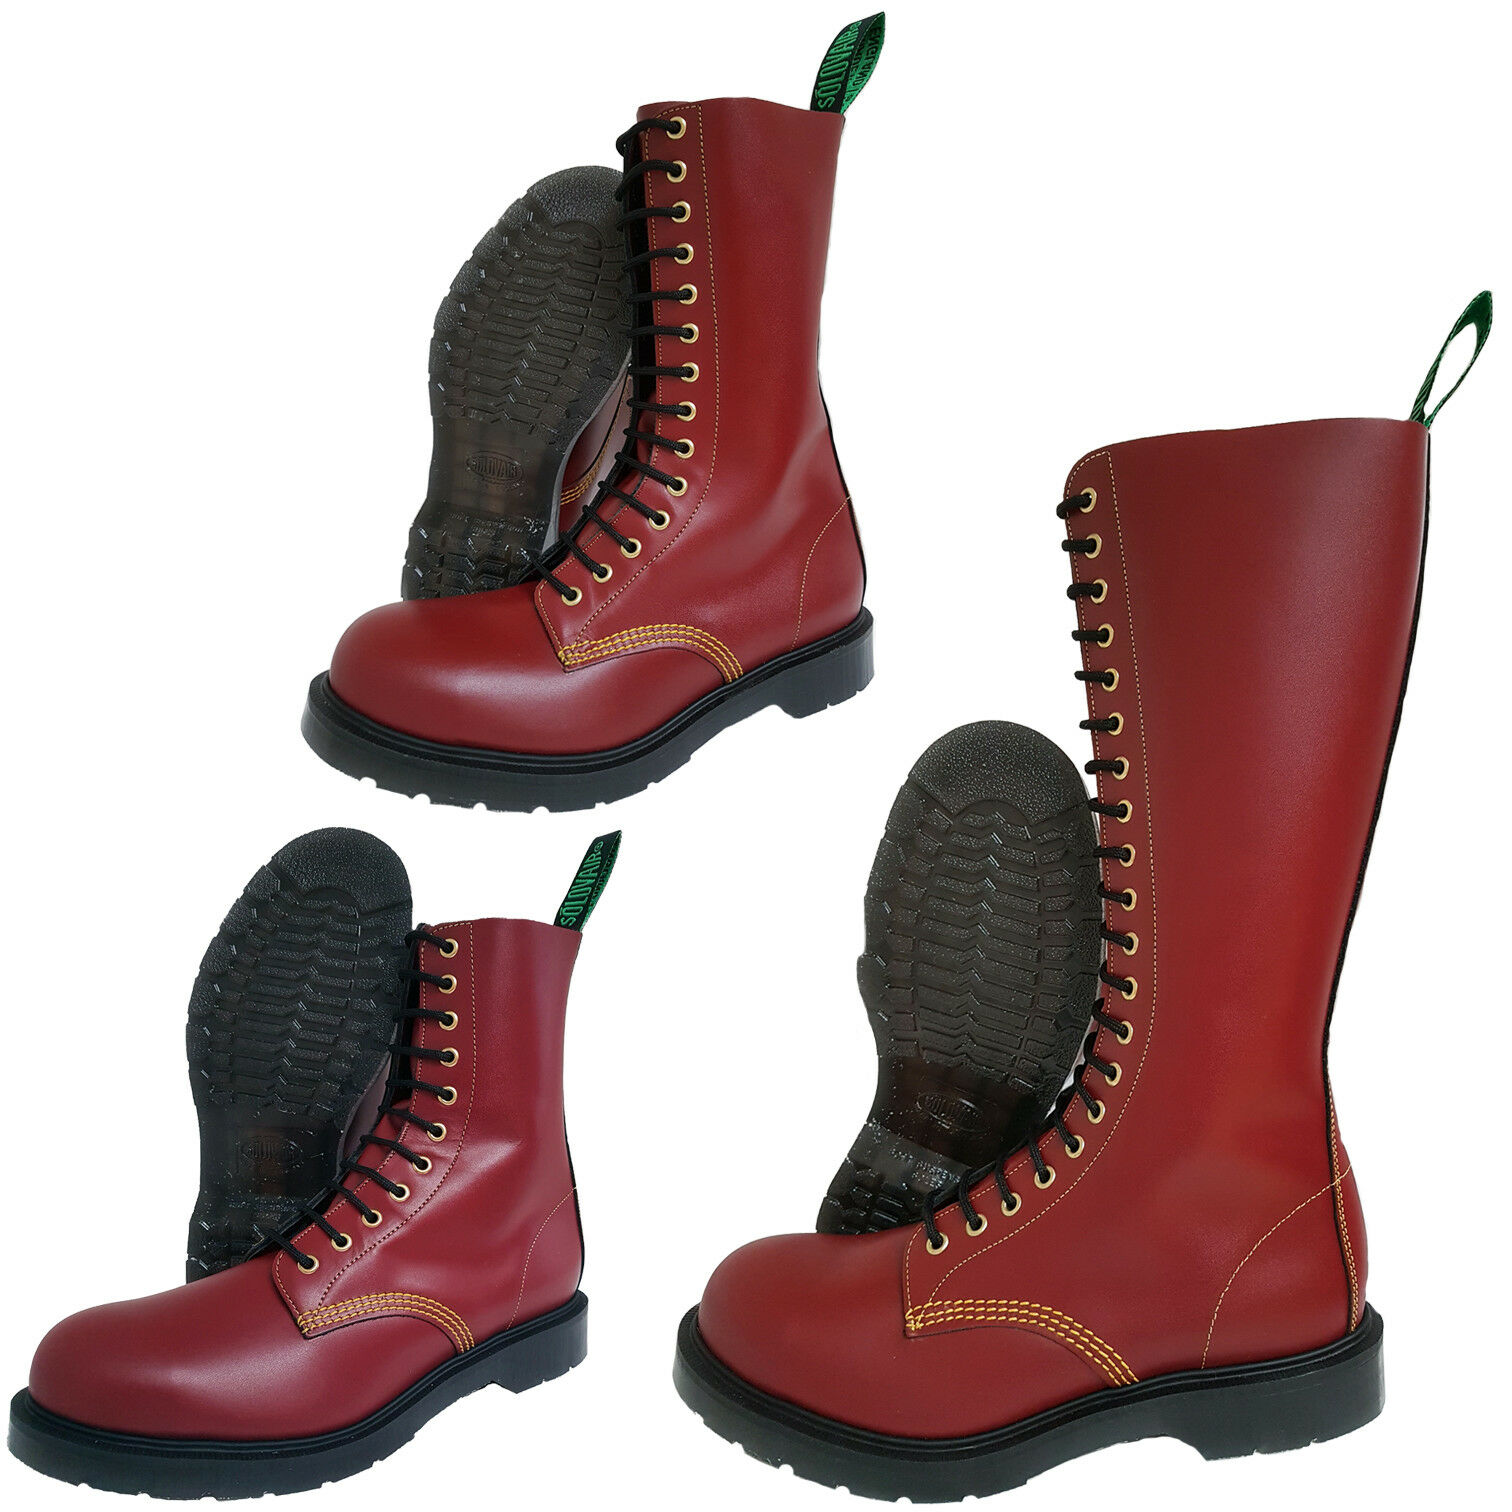 Solovair NPS Southerner made en Inglaterra Cherry rojo Steel Toe botas punk skinhead